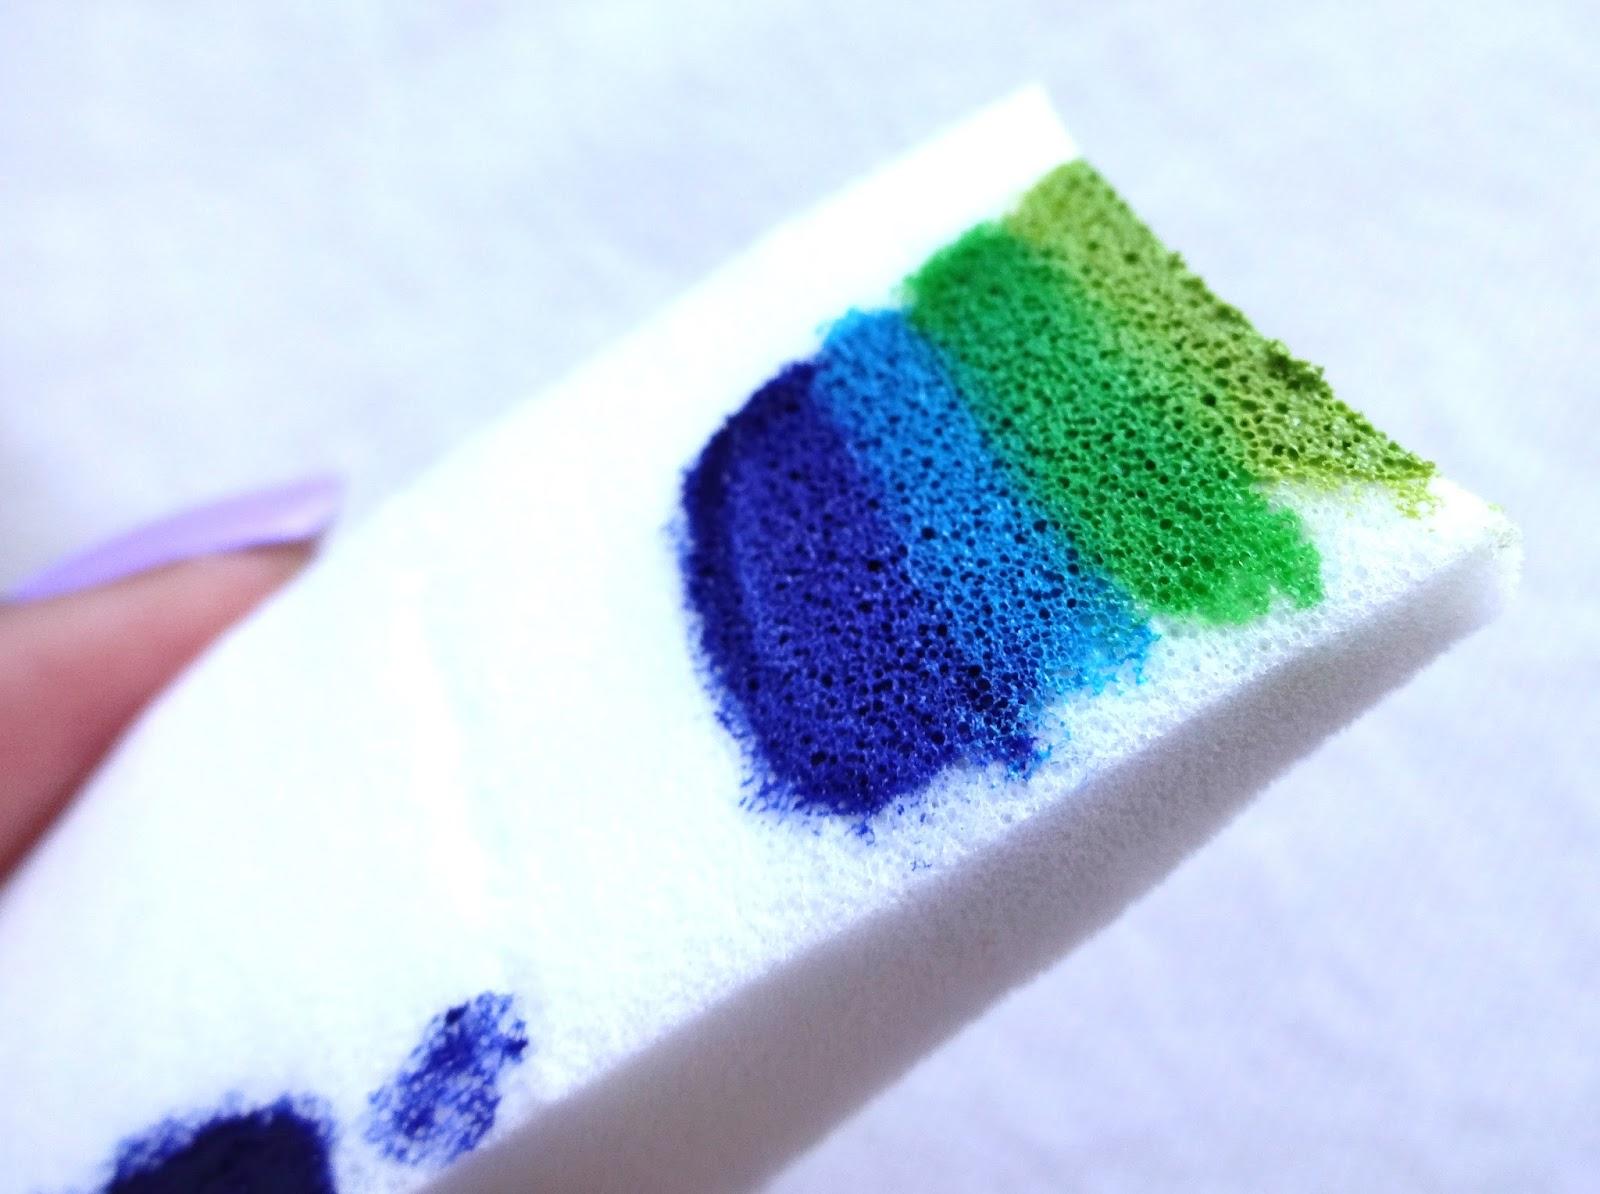 Paint gradient on sponge